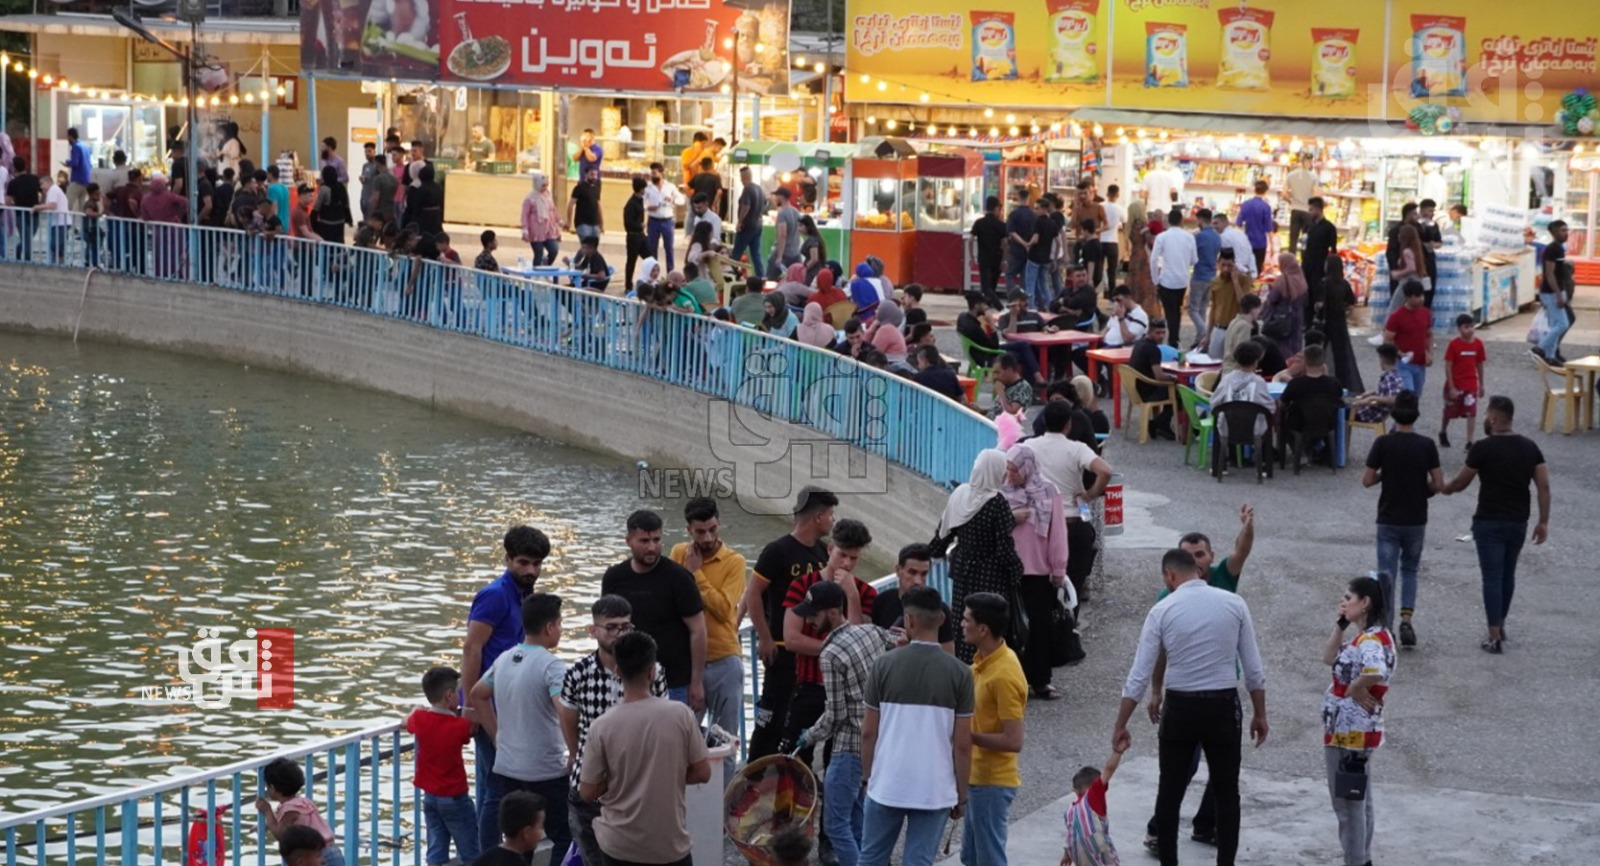 Iraqis visit the Kurdistan region to escape the hot weather